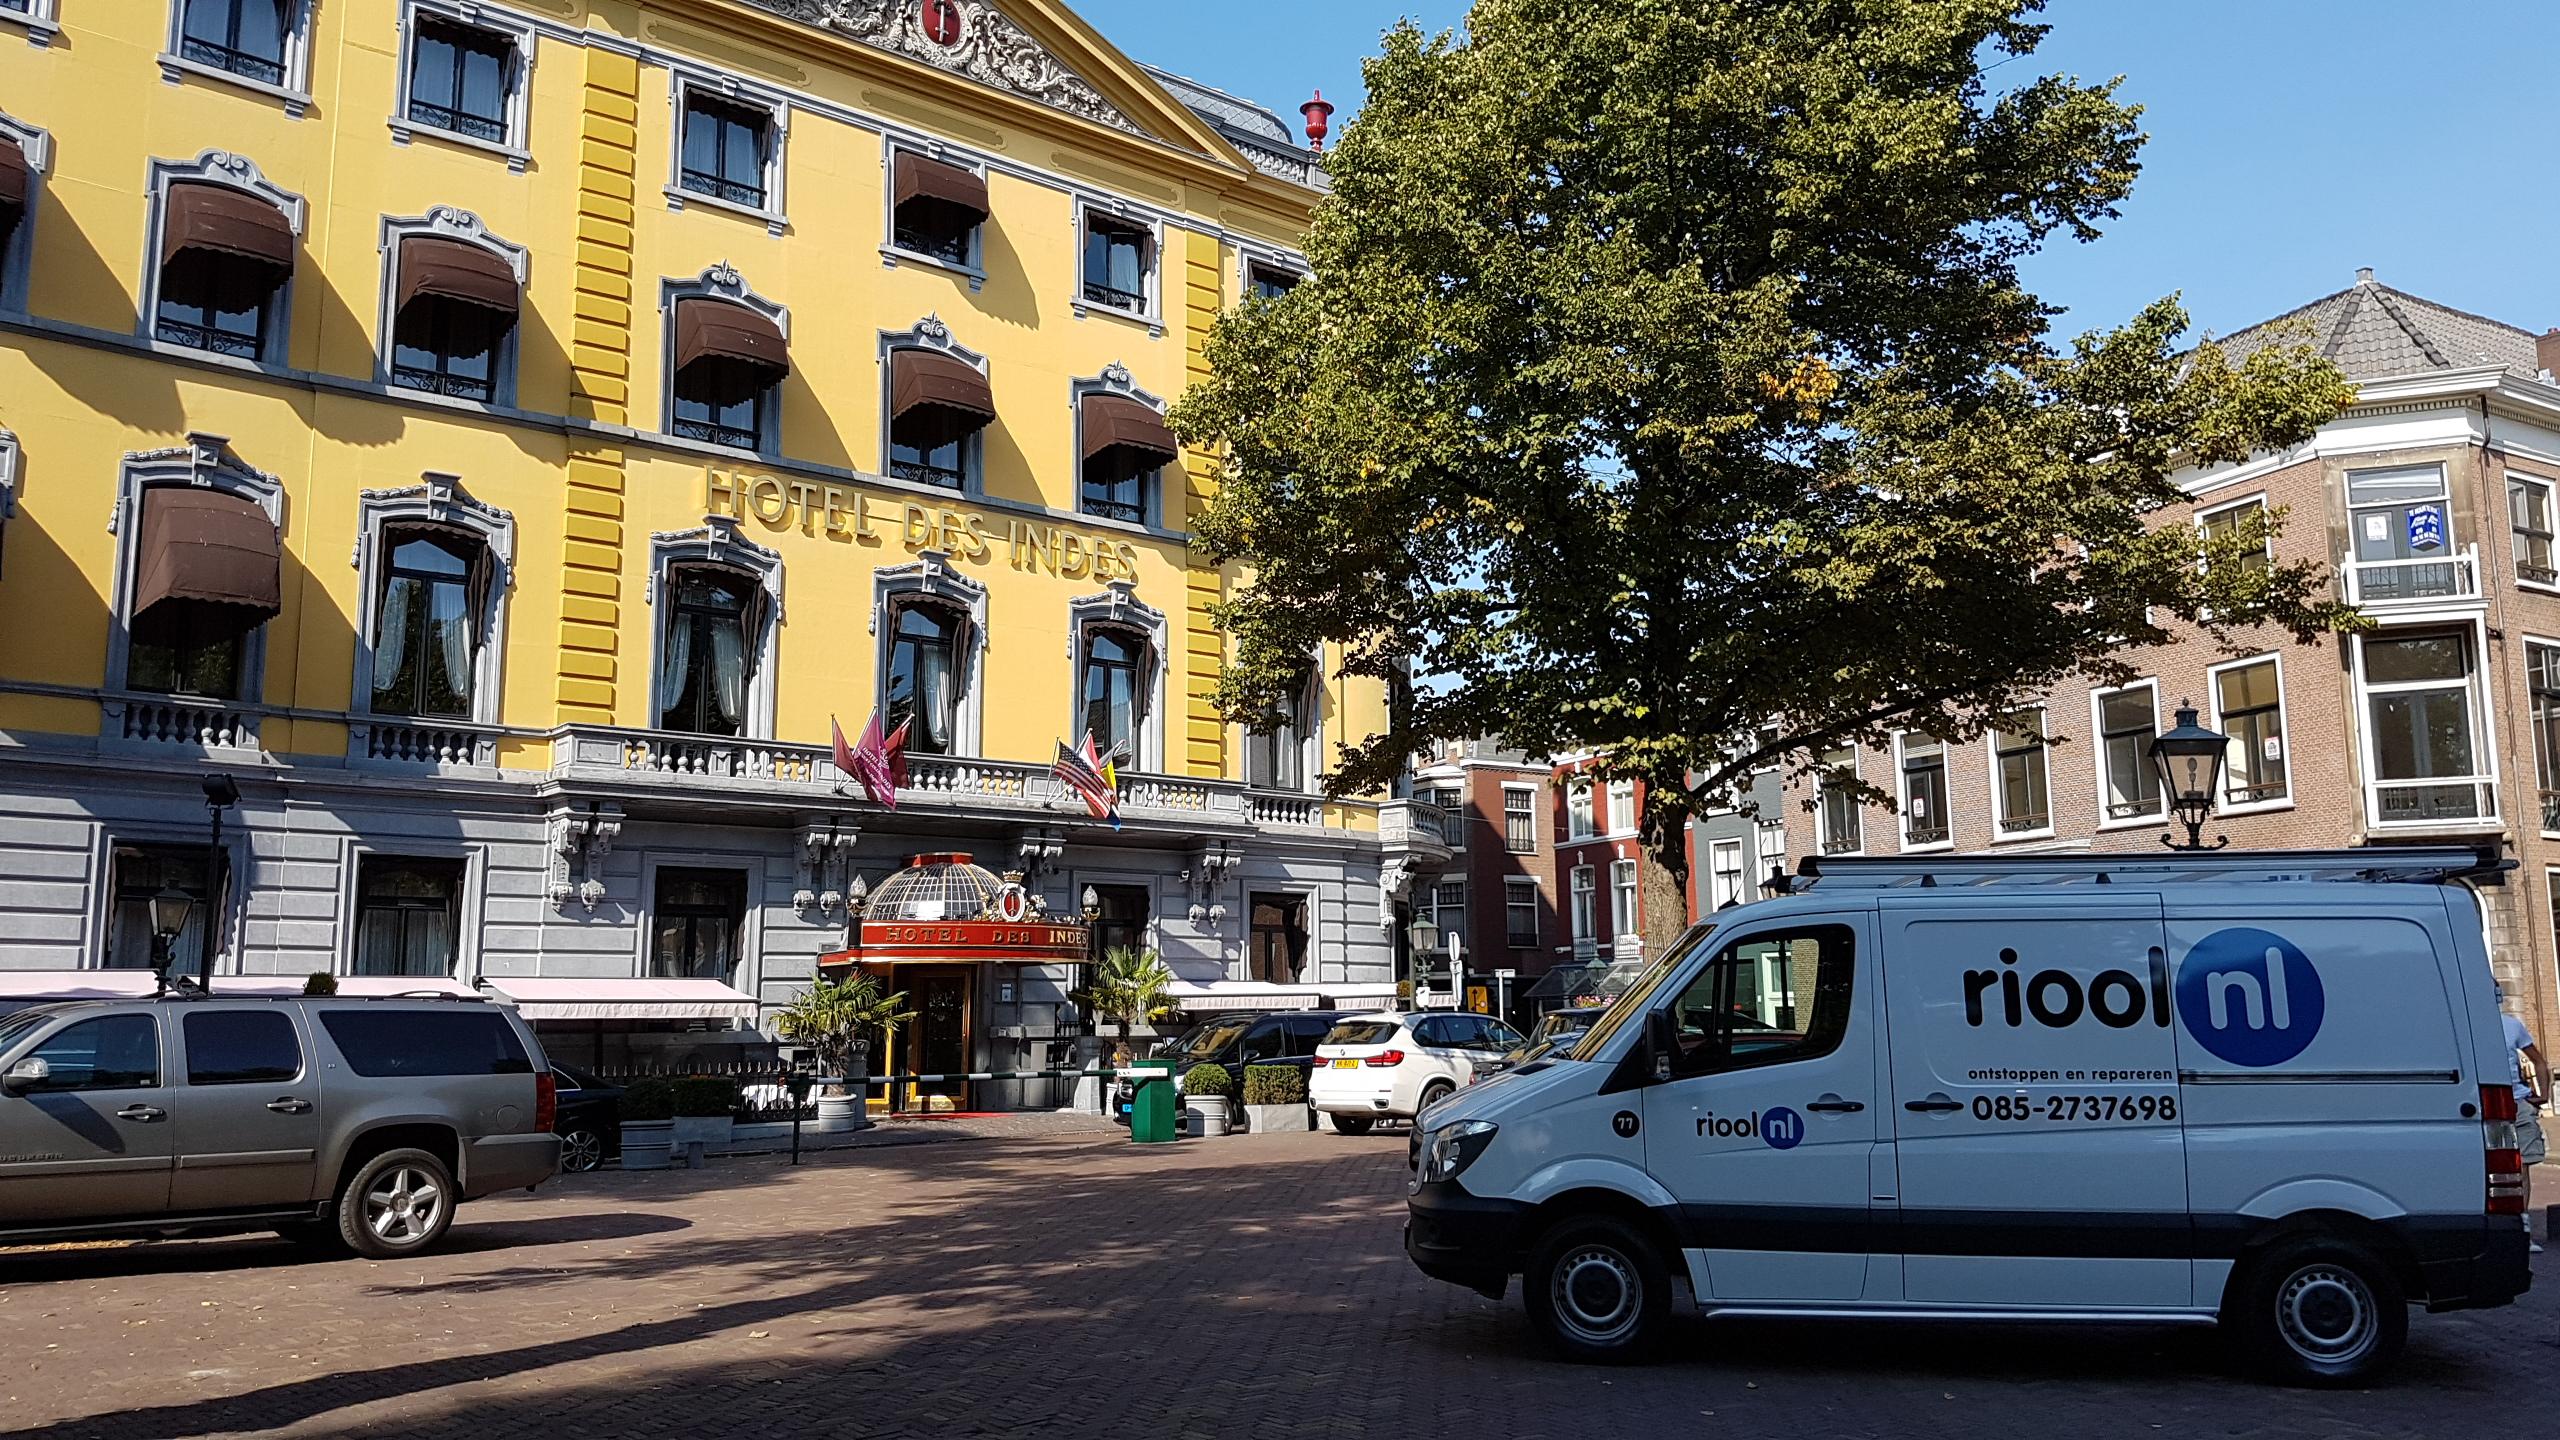 Riool verstopt den Haag, riool ontstoppen den haag, rioolvliegjes den haag, riool reinigen den haag, rioolreparatie den haag, rioolprobleem den haag, rioolservice den haag, ontstoppingsbedrijf den haag, loodgieter den haag